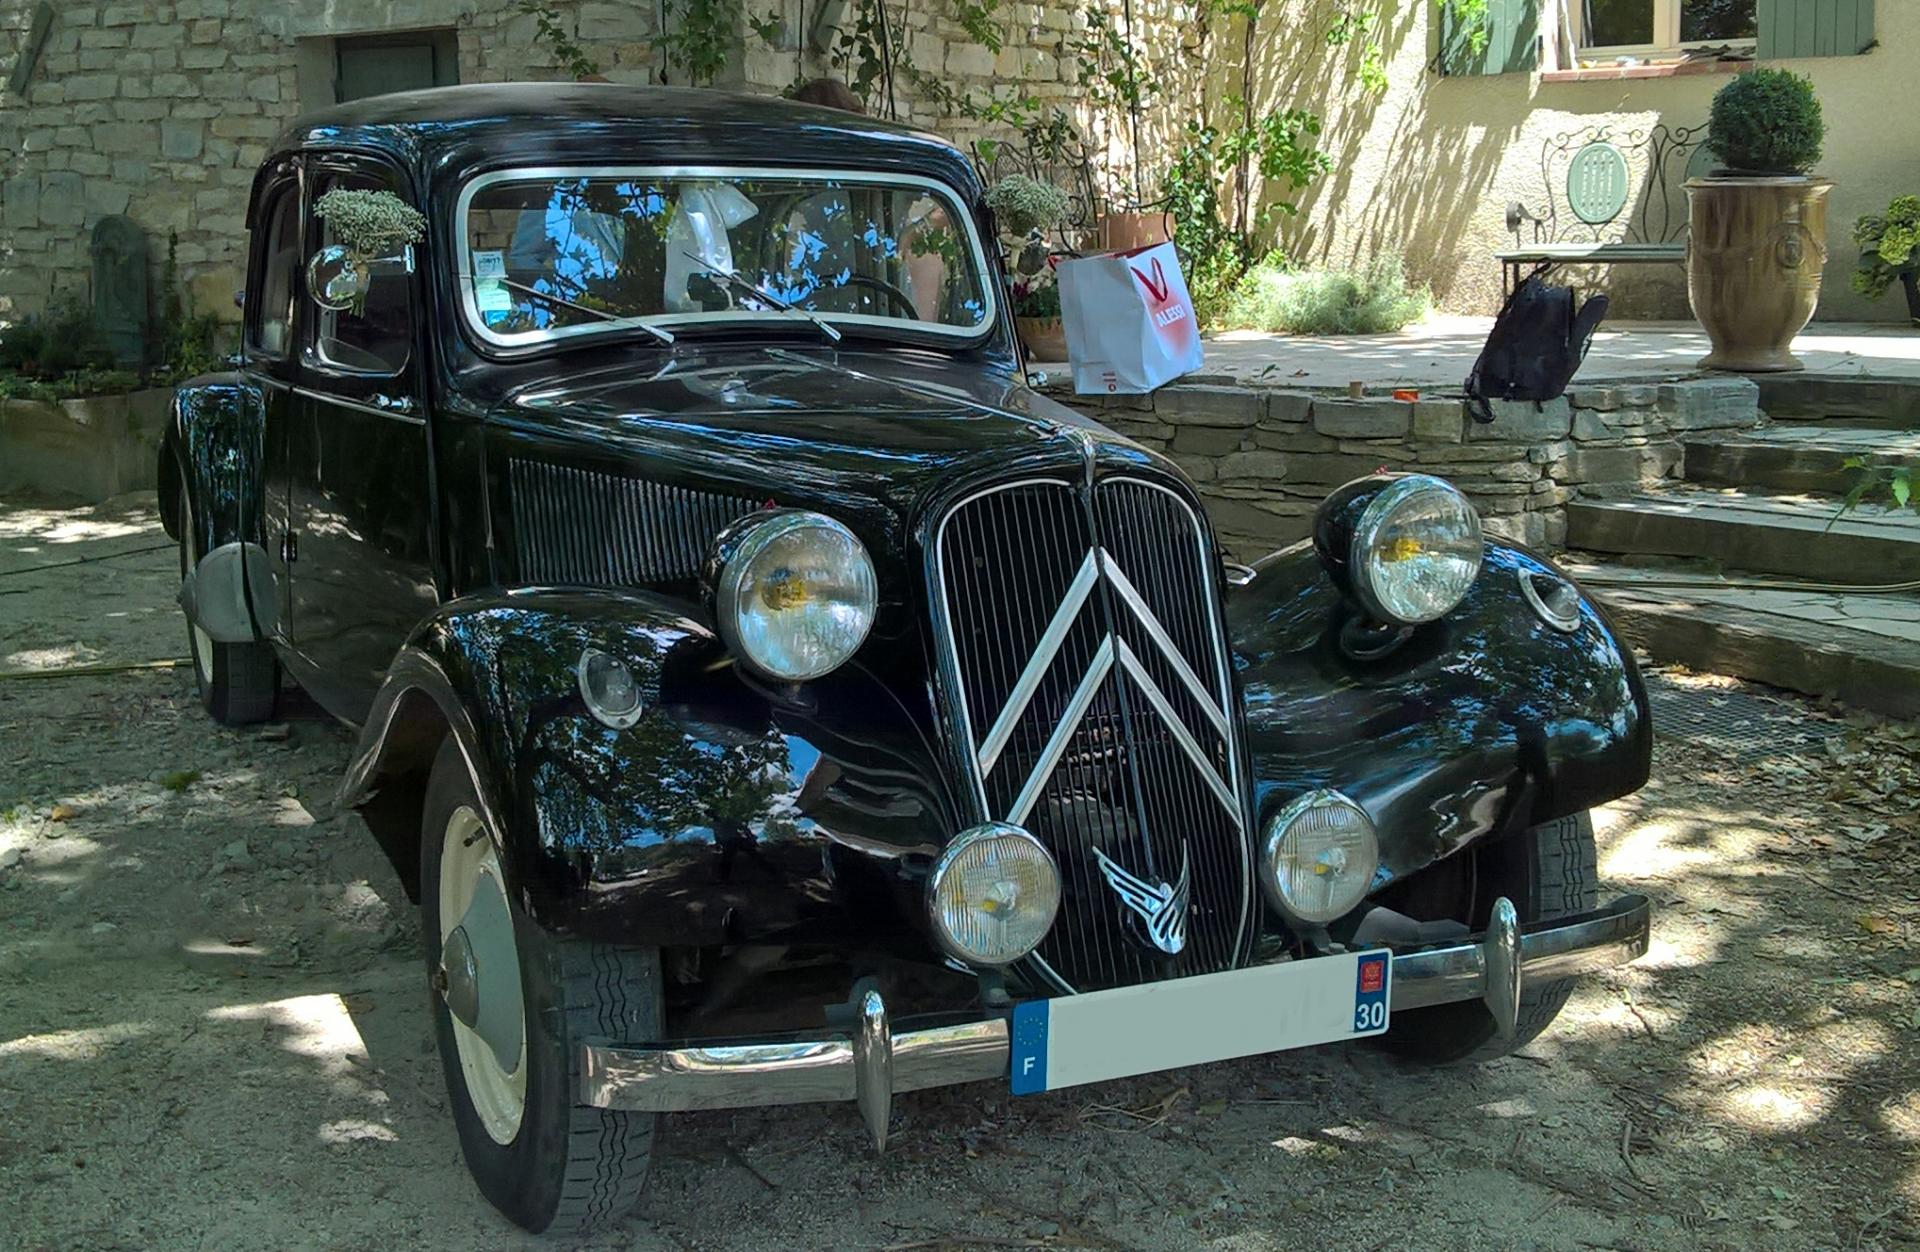 1952 Citroën Traction 11 BL